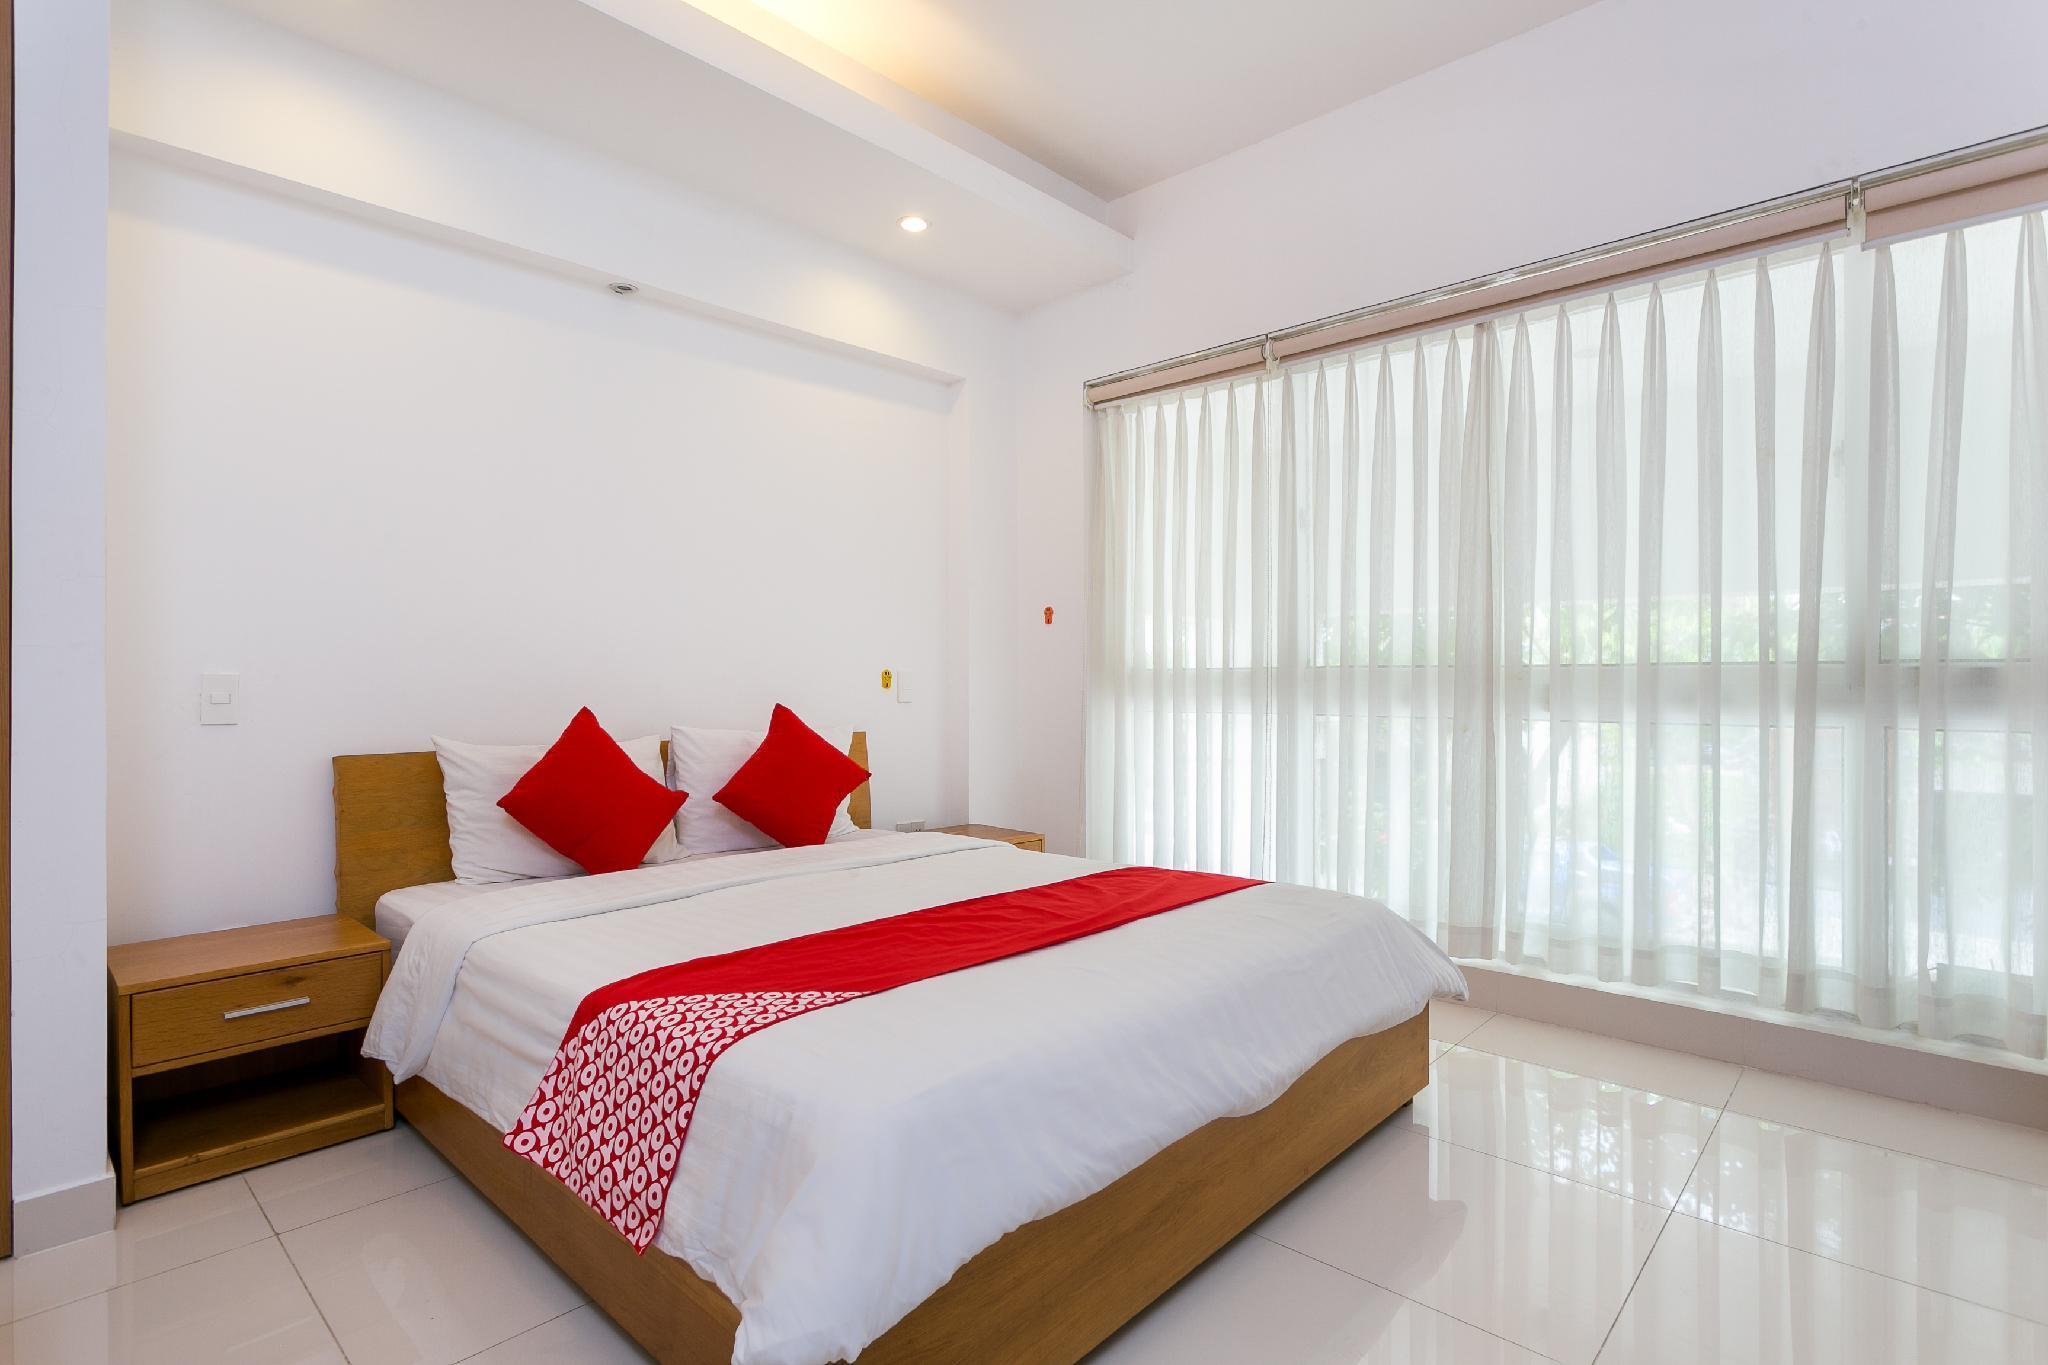 OYO 611 Phuket Krabala Hotel